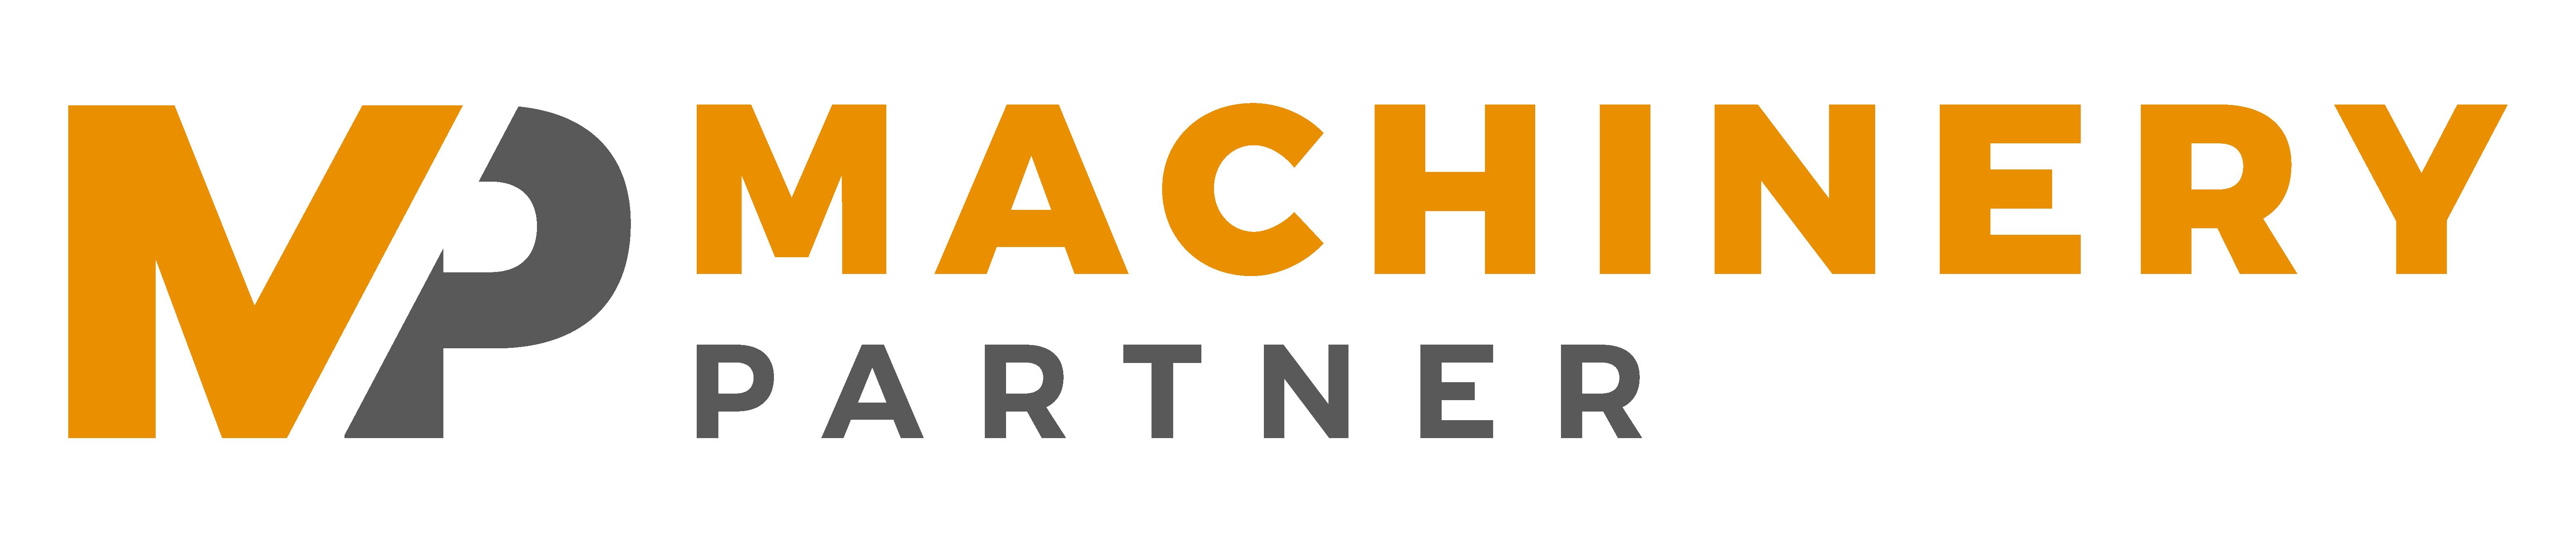 Machinery partner heavy machinery marketplace logo